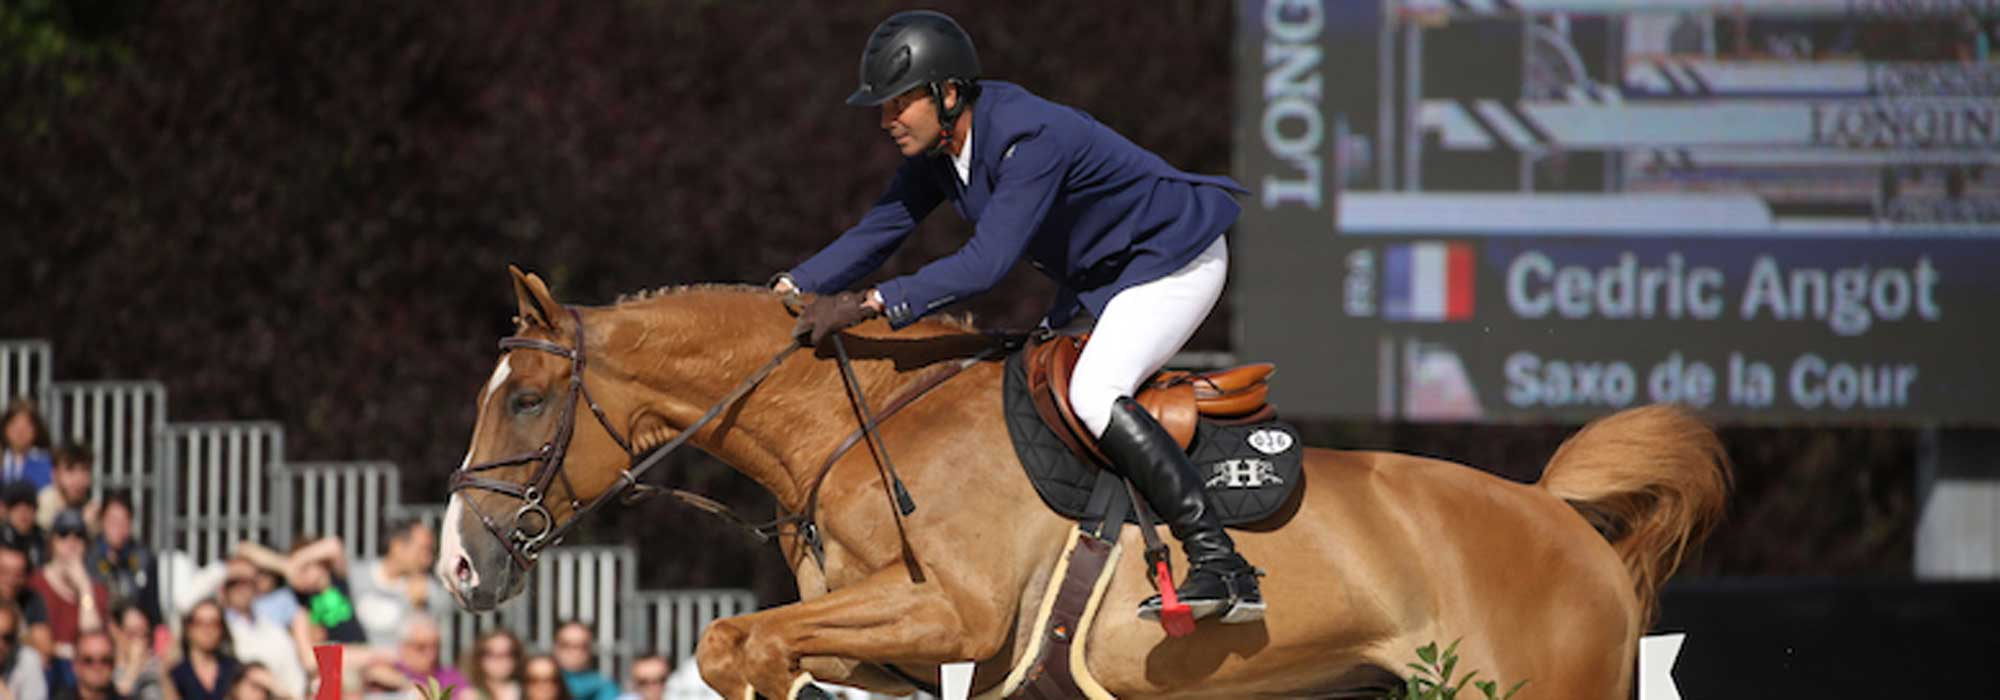 Cédric Angot cavalier Horsefeed